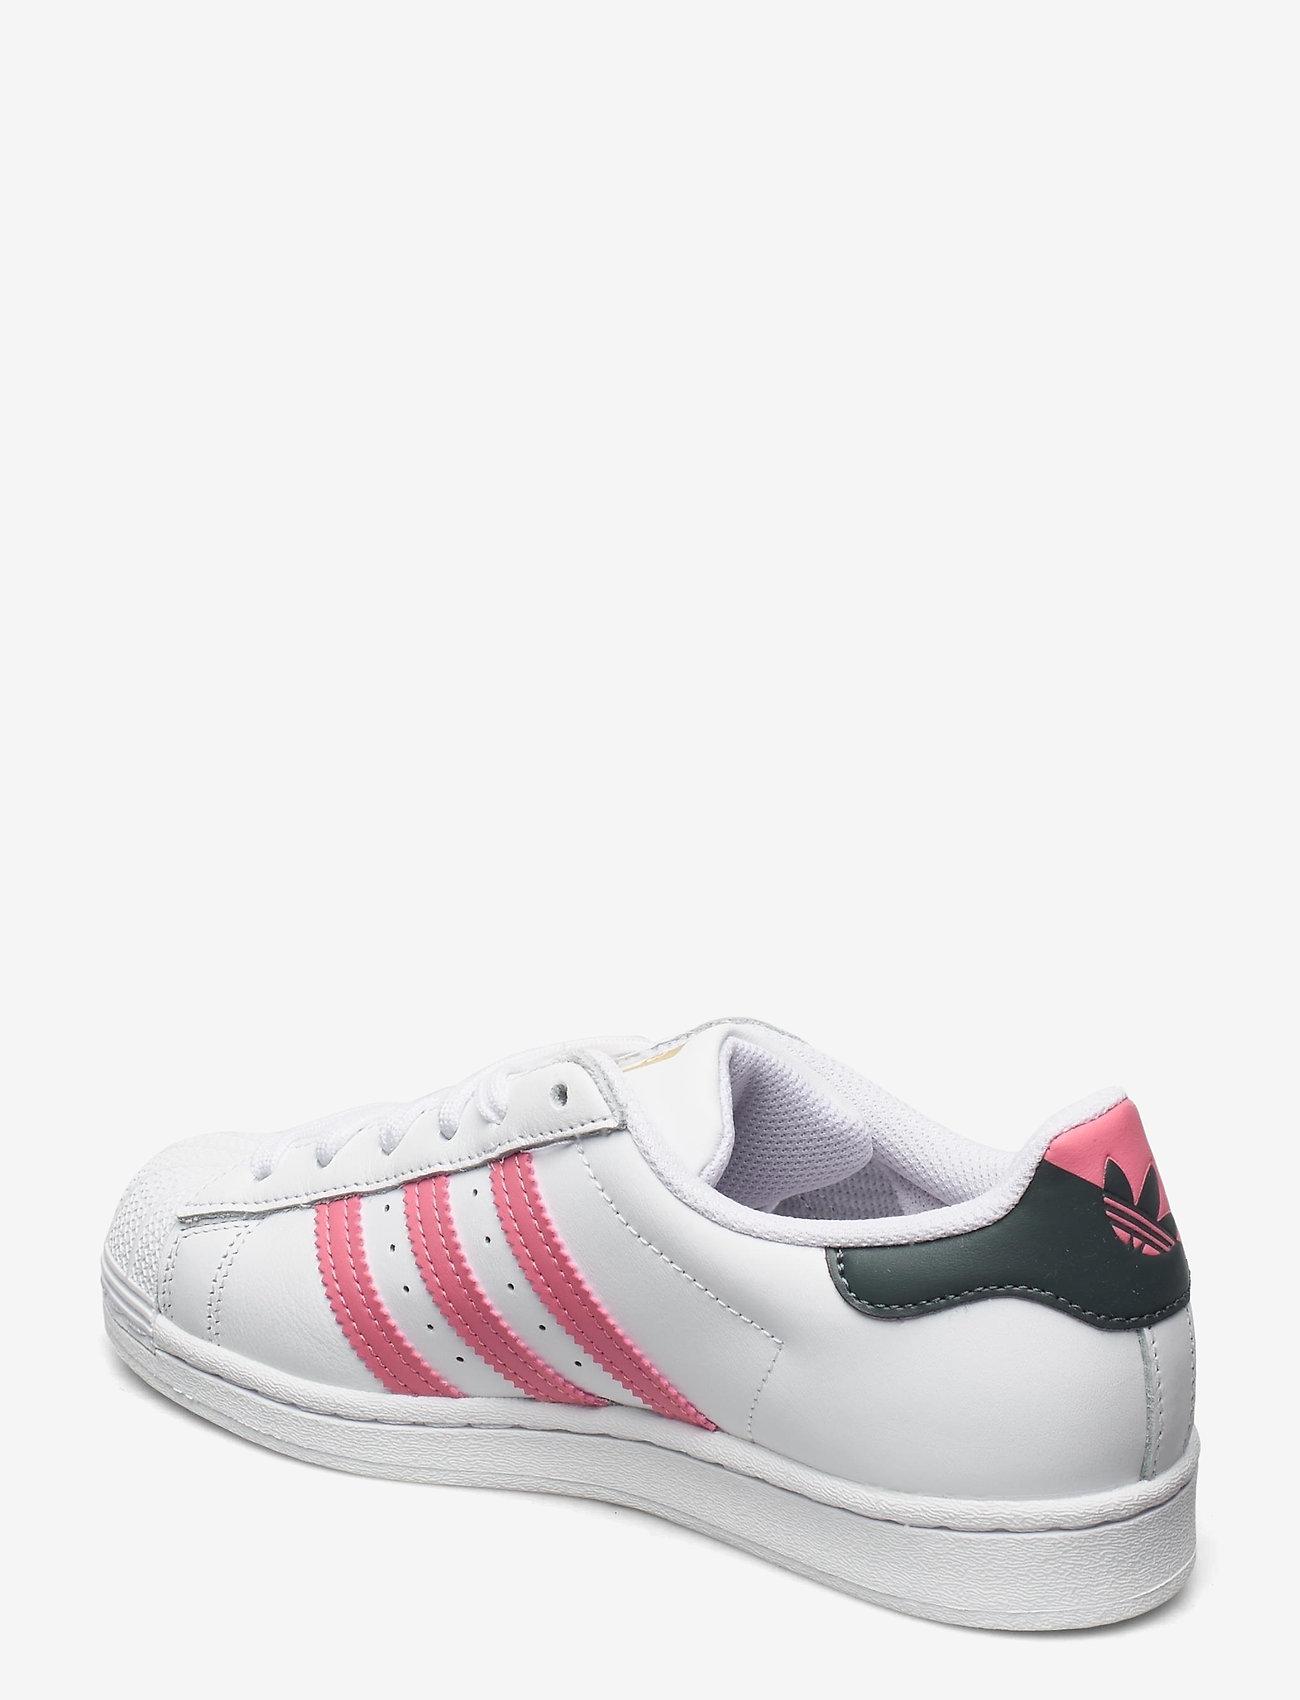 adidas Originals - Superstar W - low top sneakers - ftwwht/bluoxi/goldmt - 2